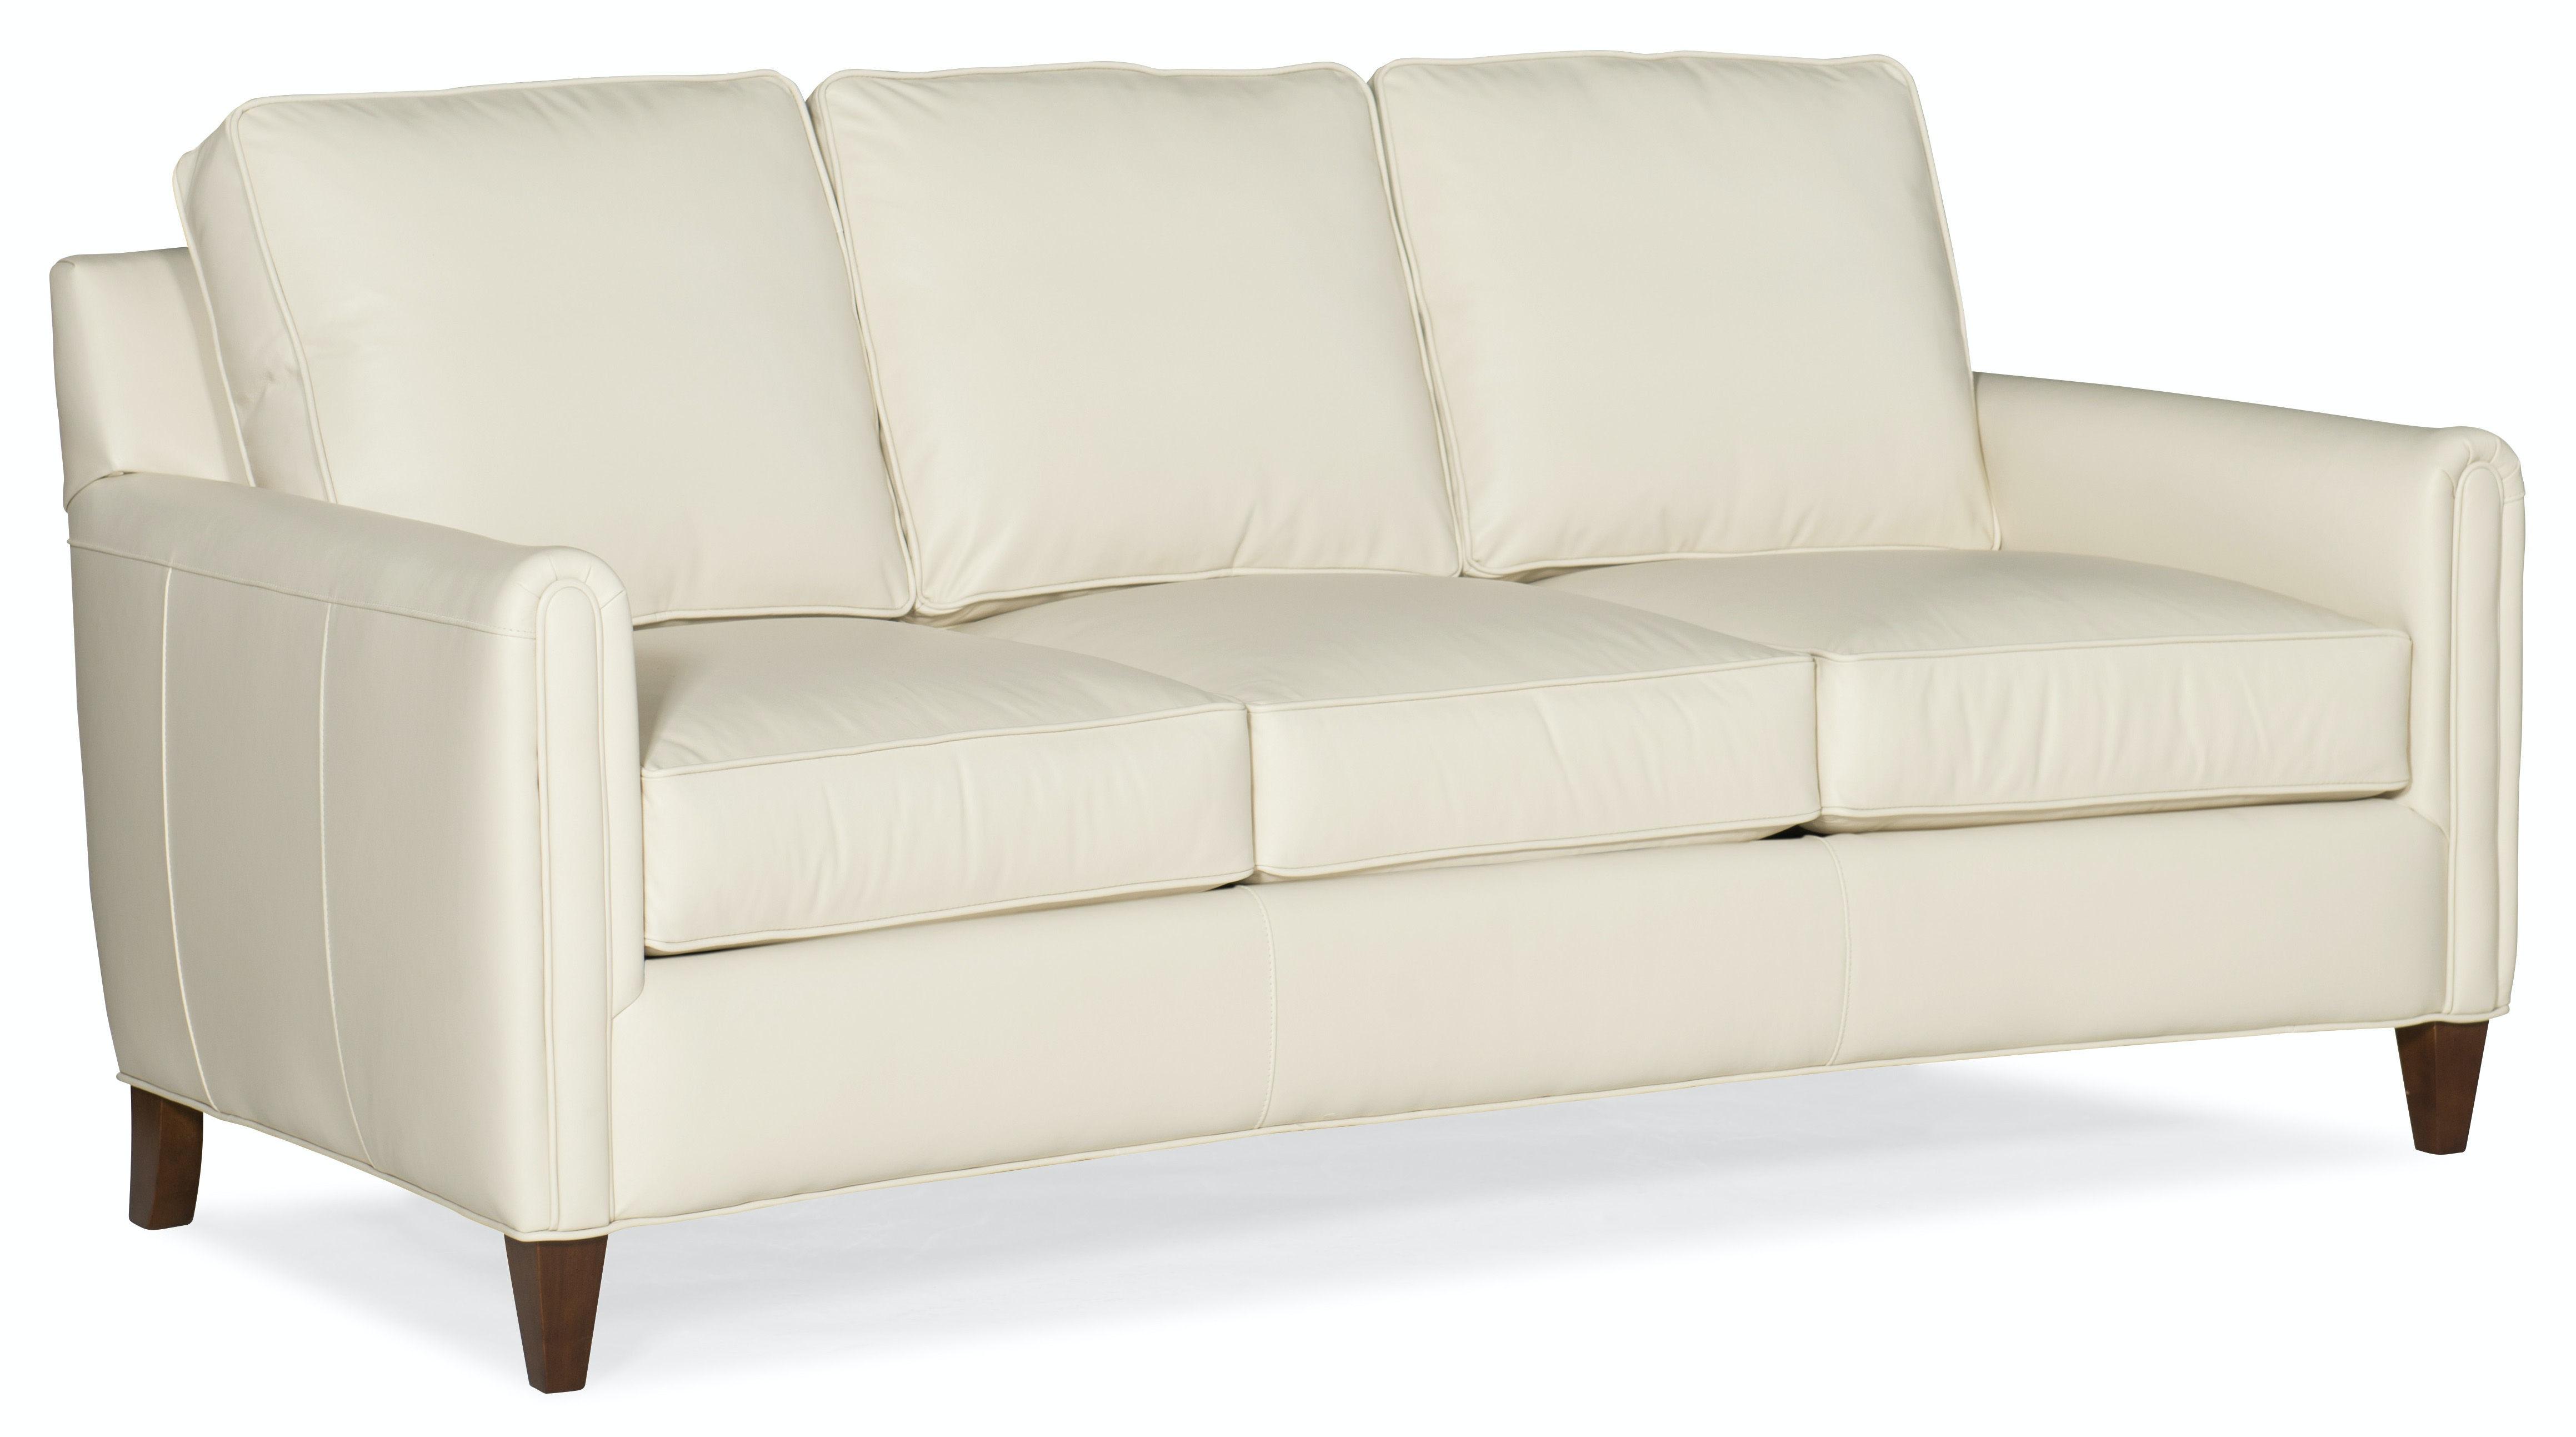 Bradington Young Living Room Weiss Stationary Sofa 8 Way Tie 513 95